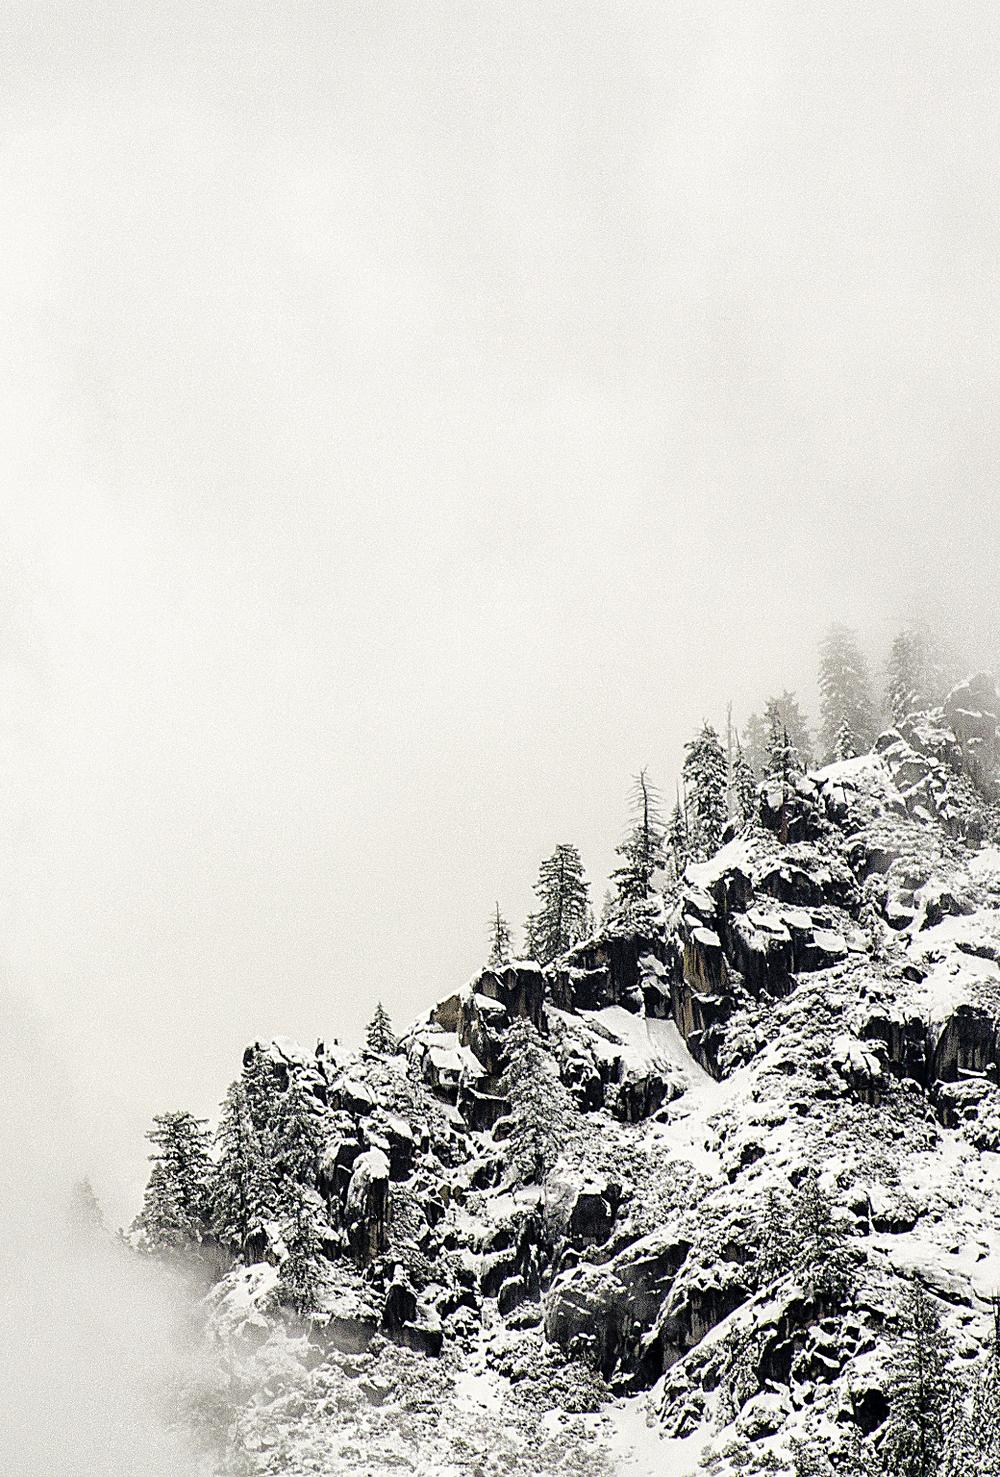 Wasim_Muklashy_Photography_Yosemite_Lady_In_White_iPhone5